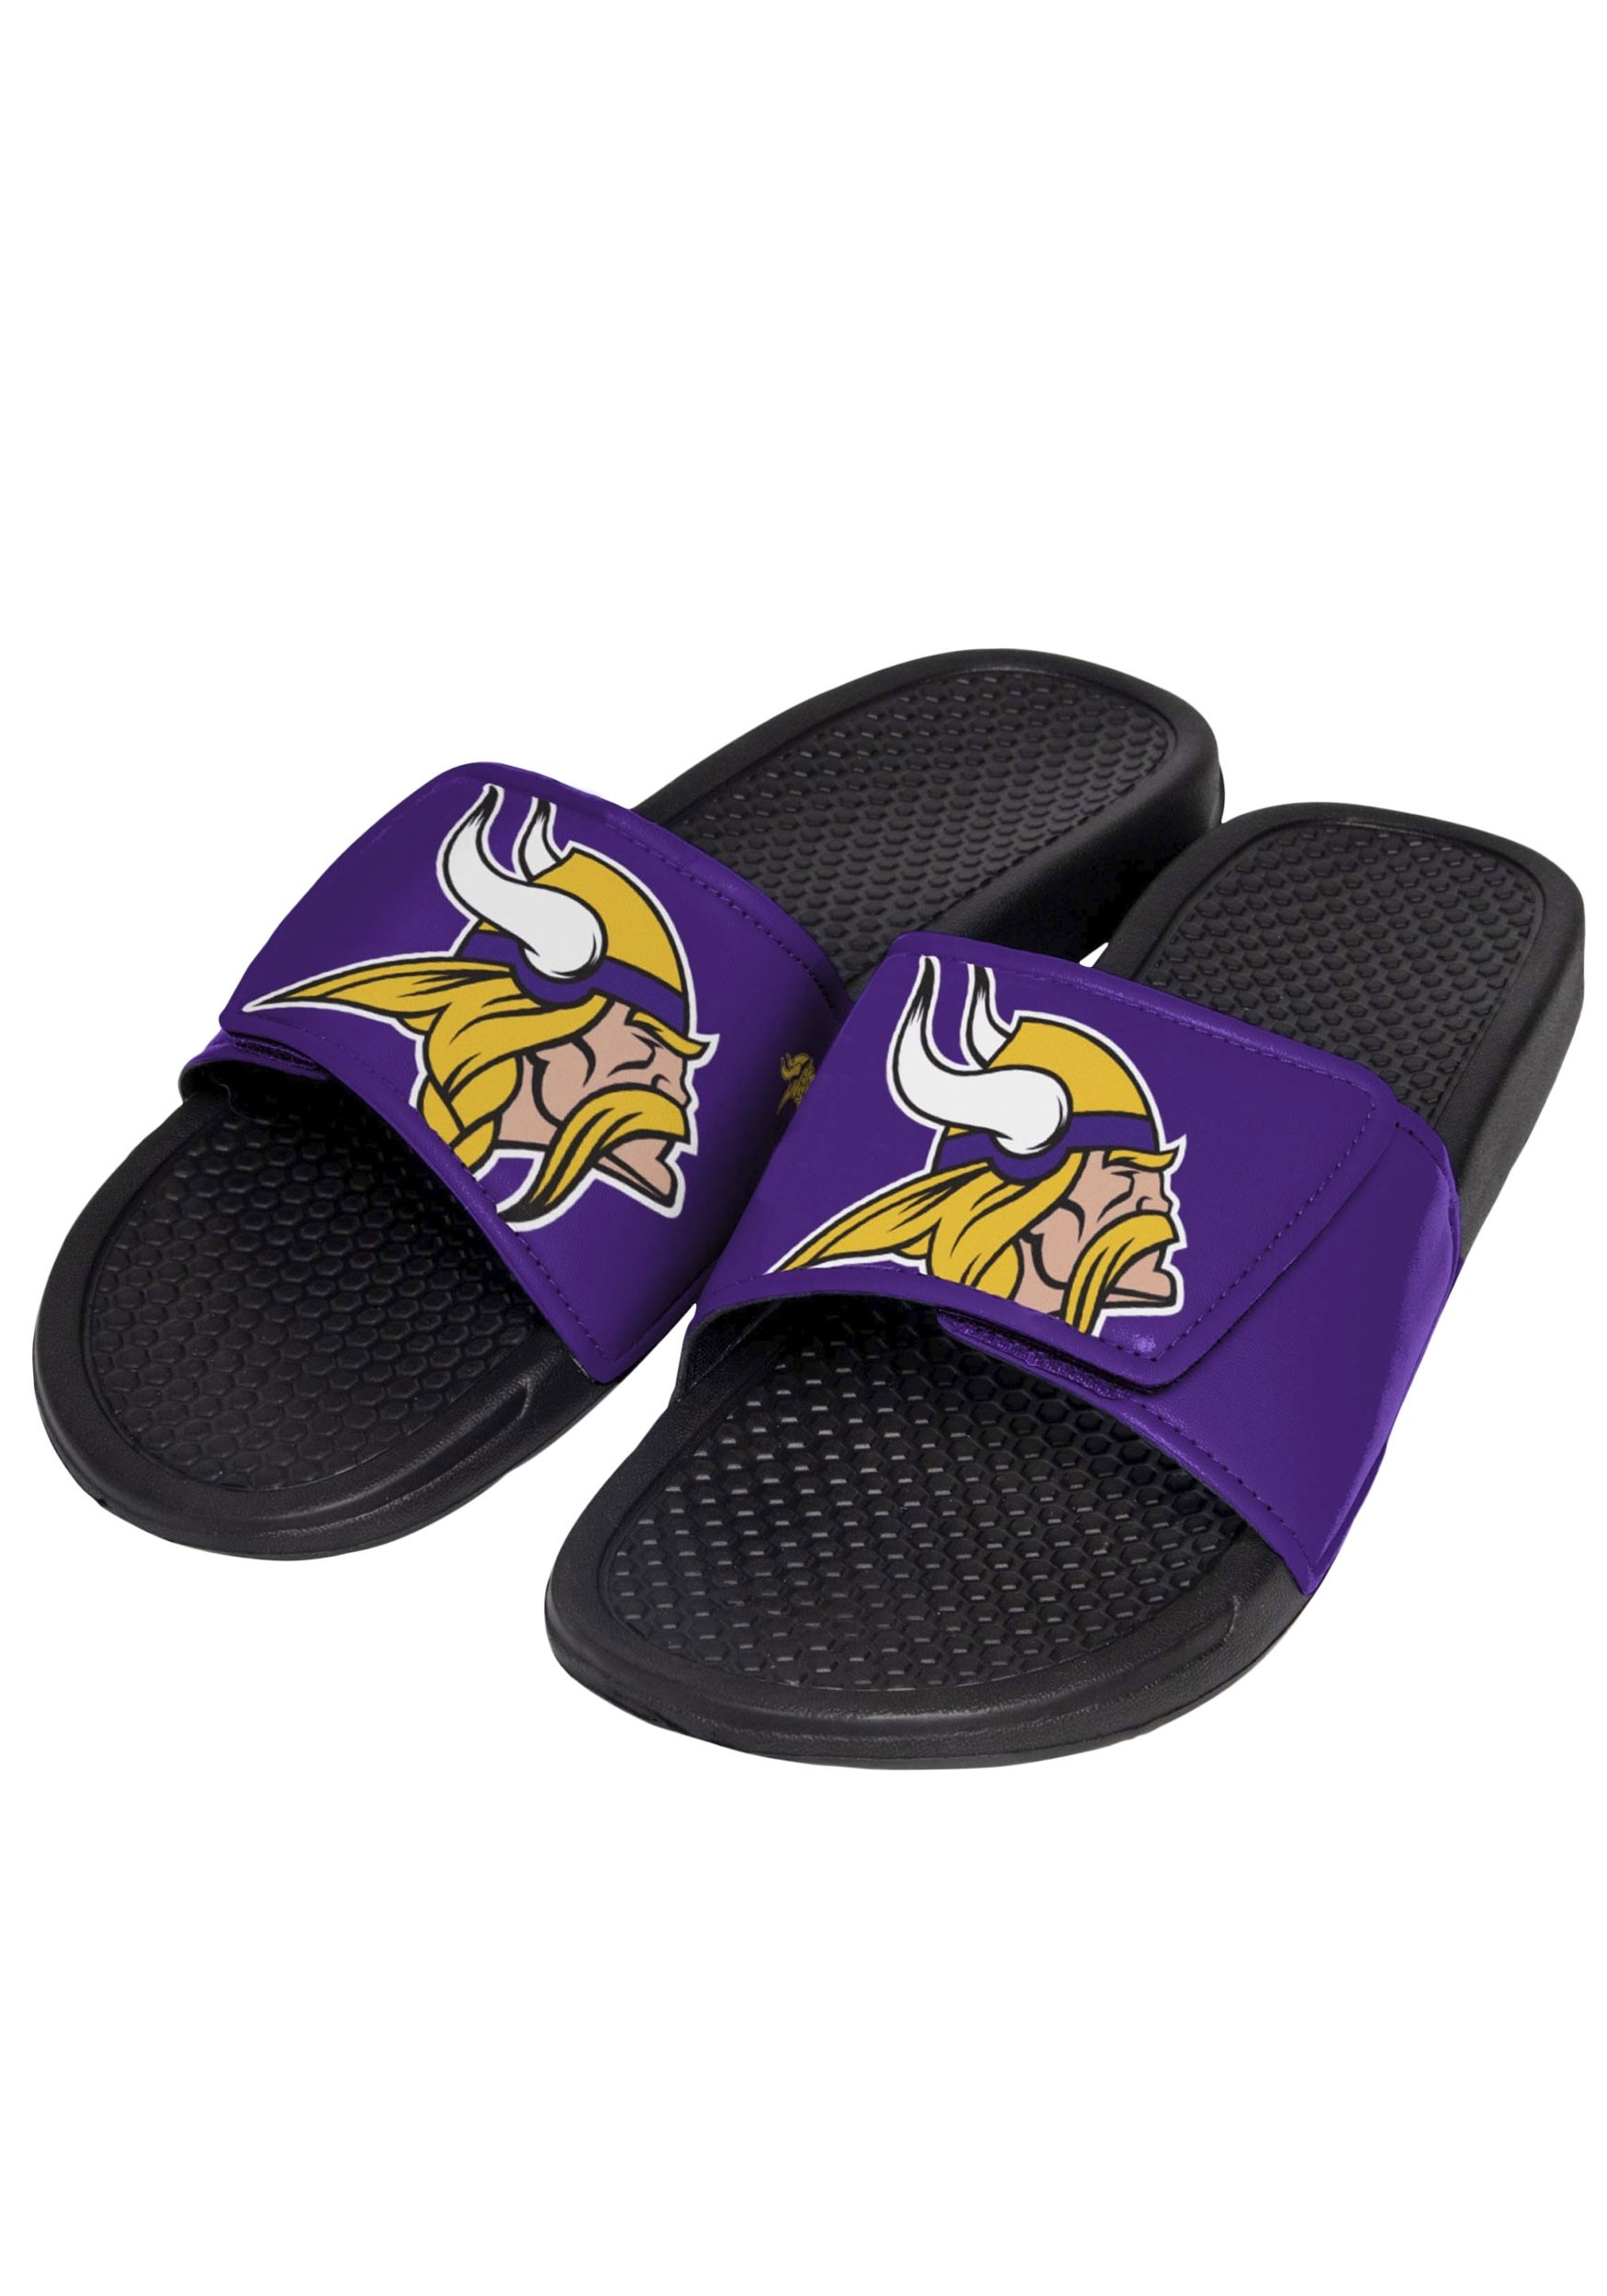 22bb68fa0b4 Minnesota Vikings Cropped Big Logo Slide Men s Flip Flop